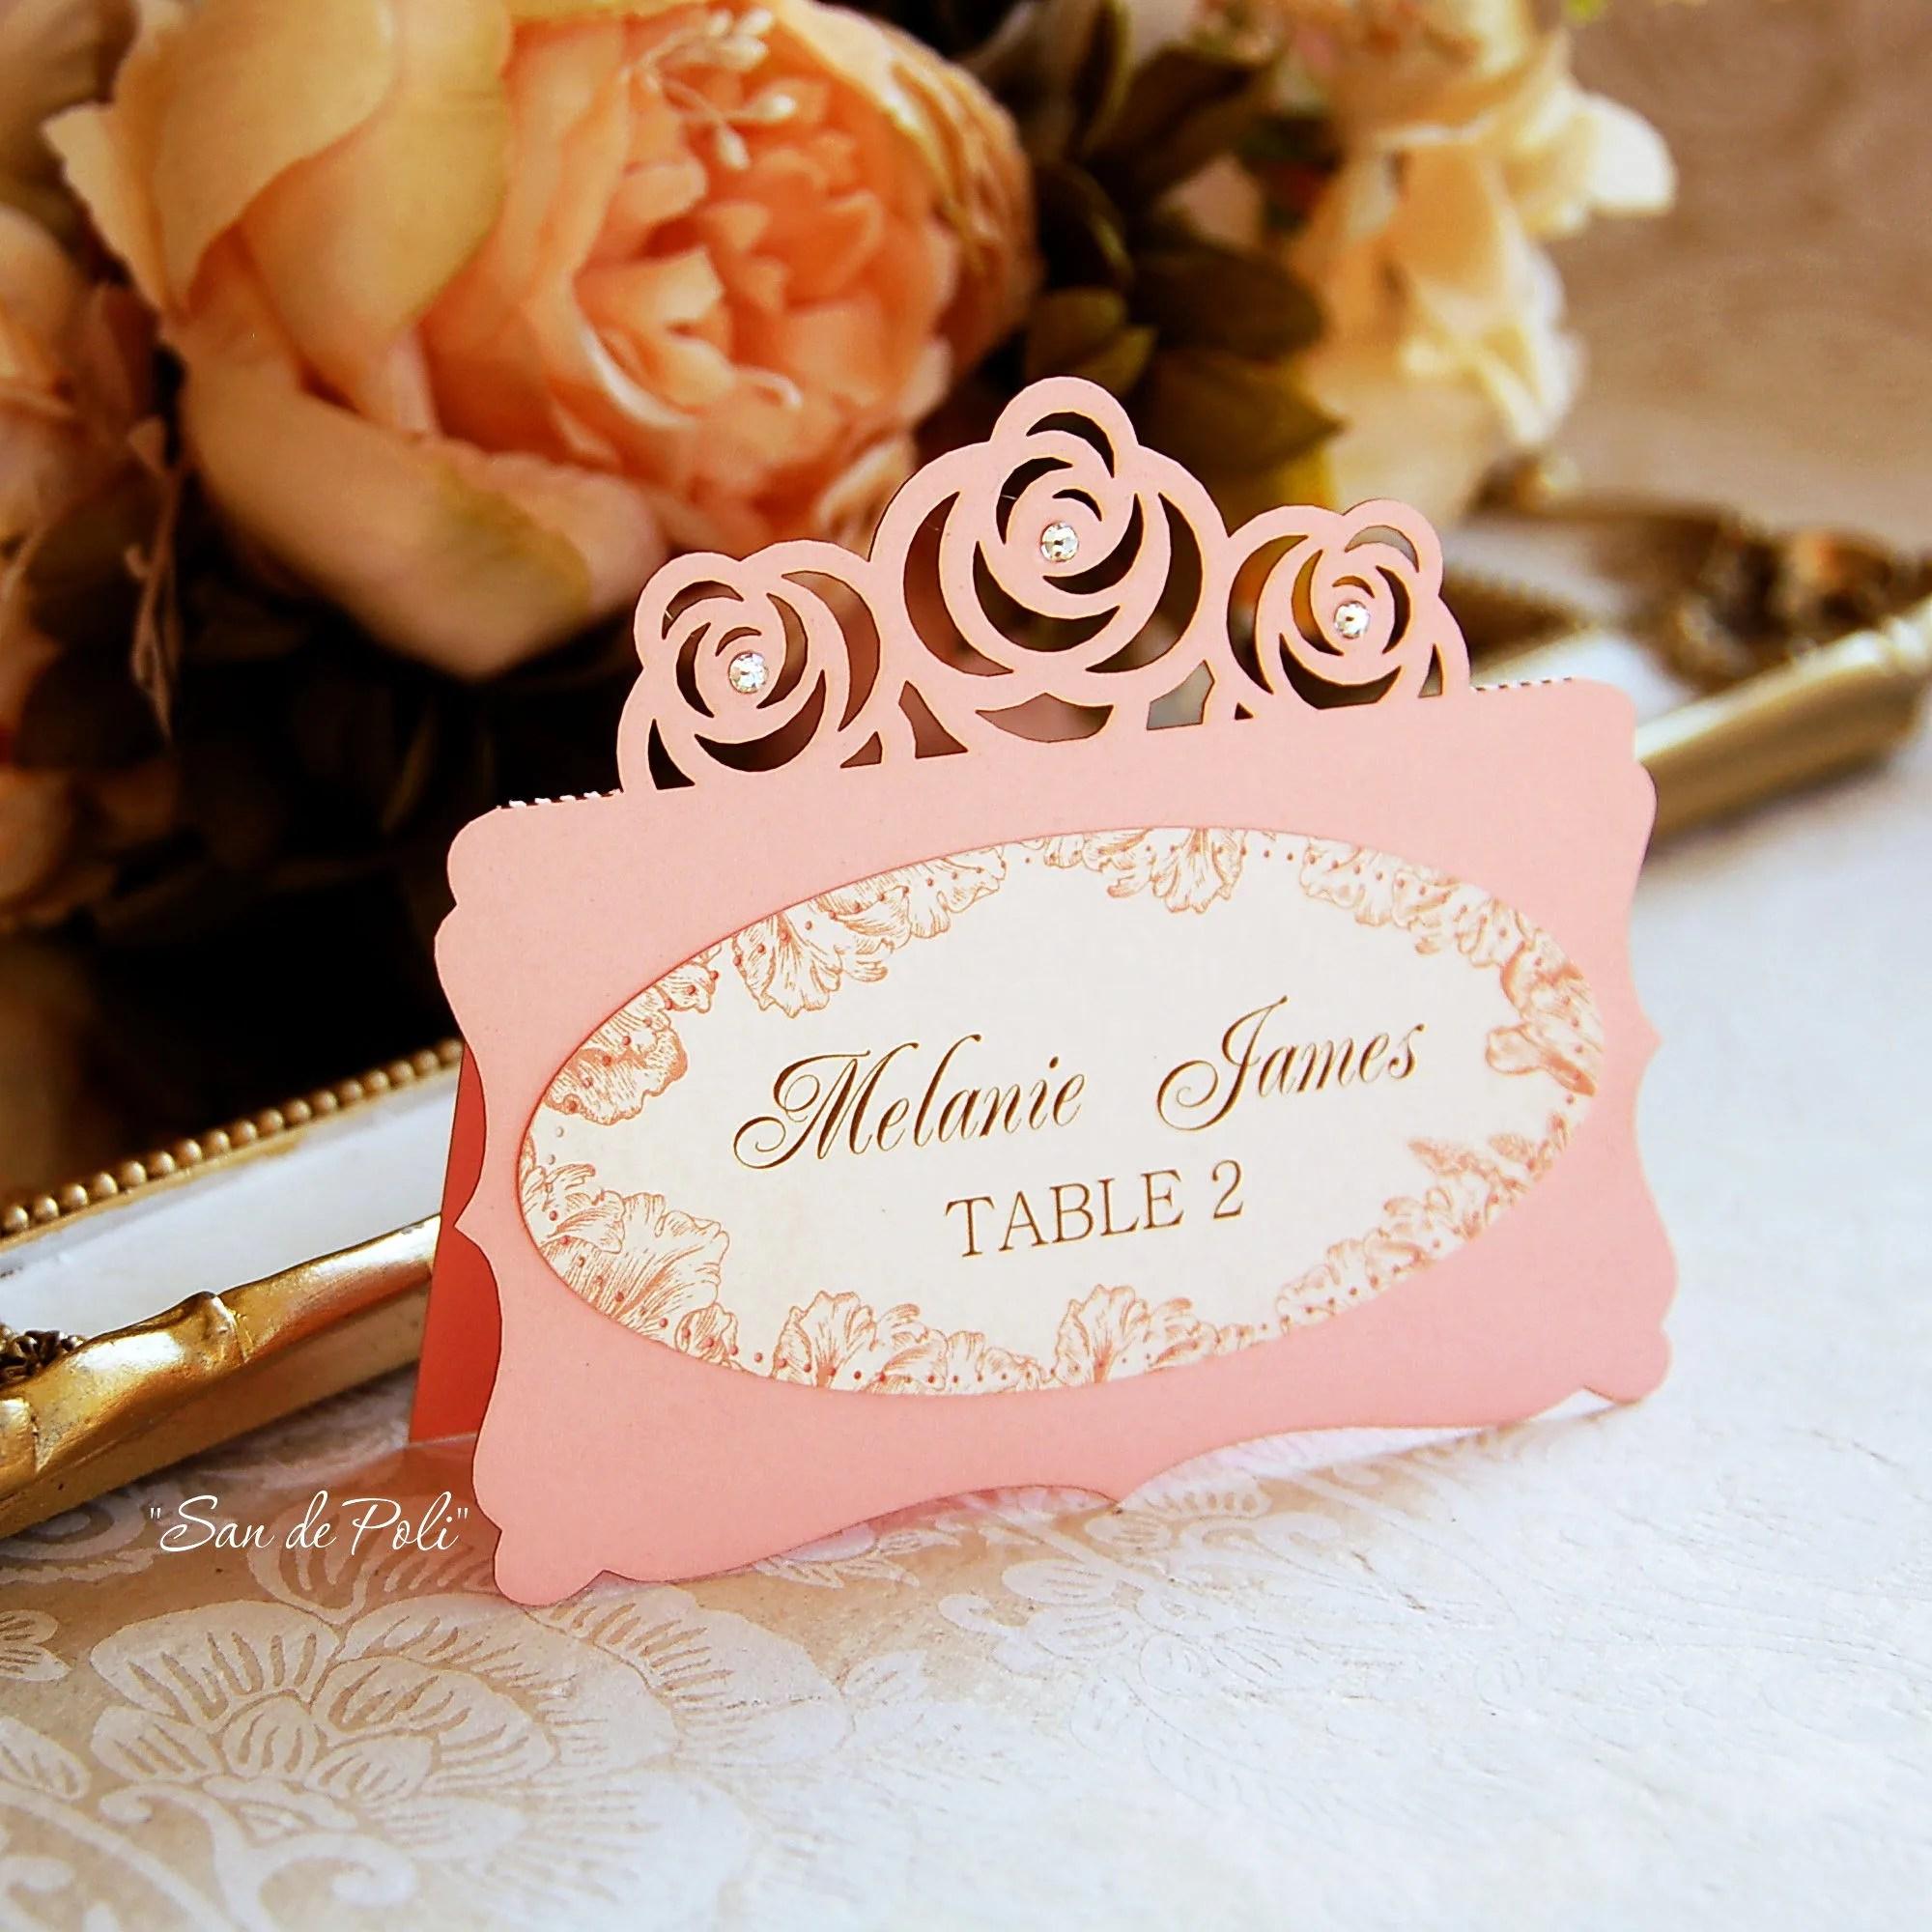 wedding placecard templates